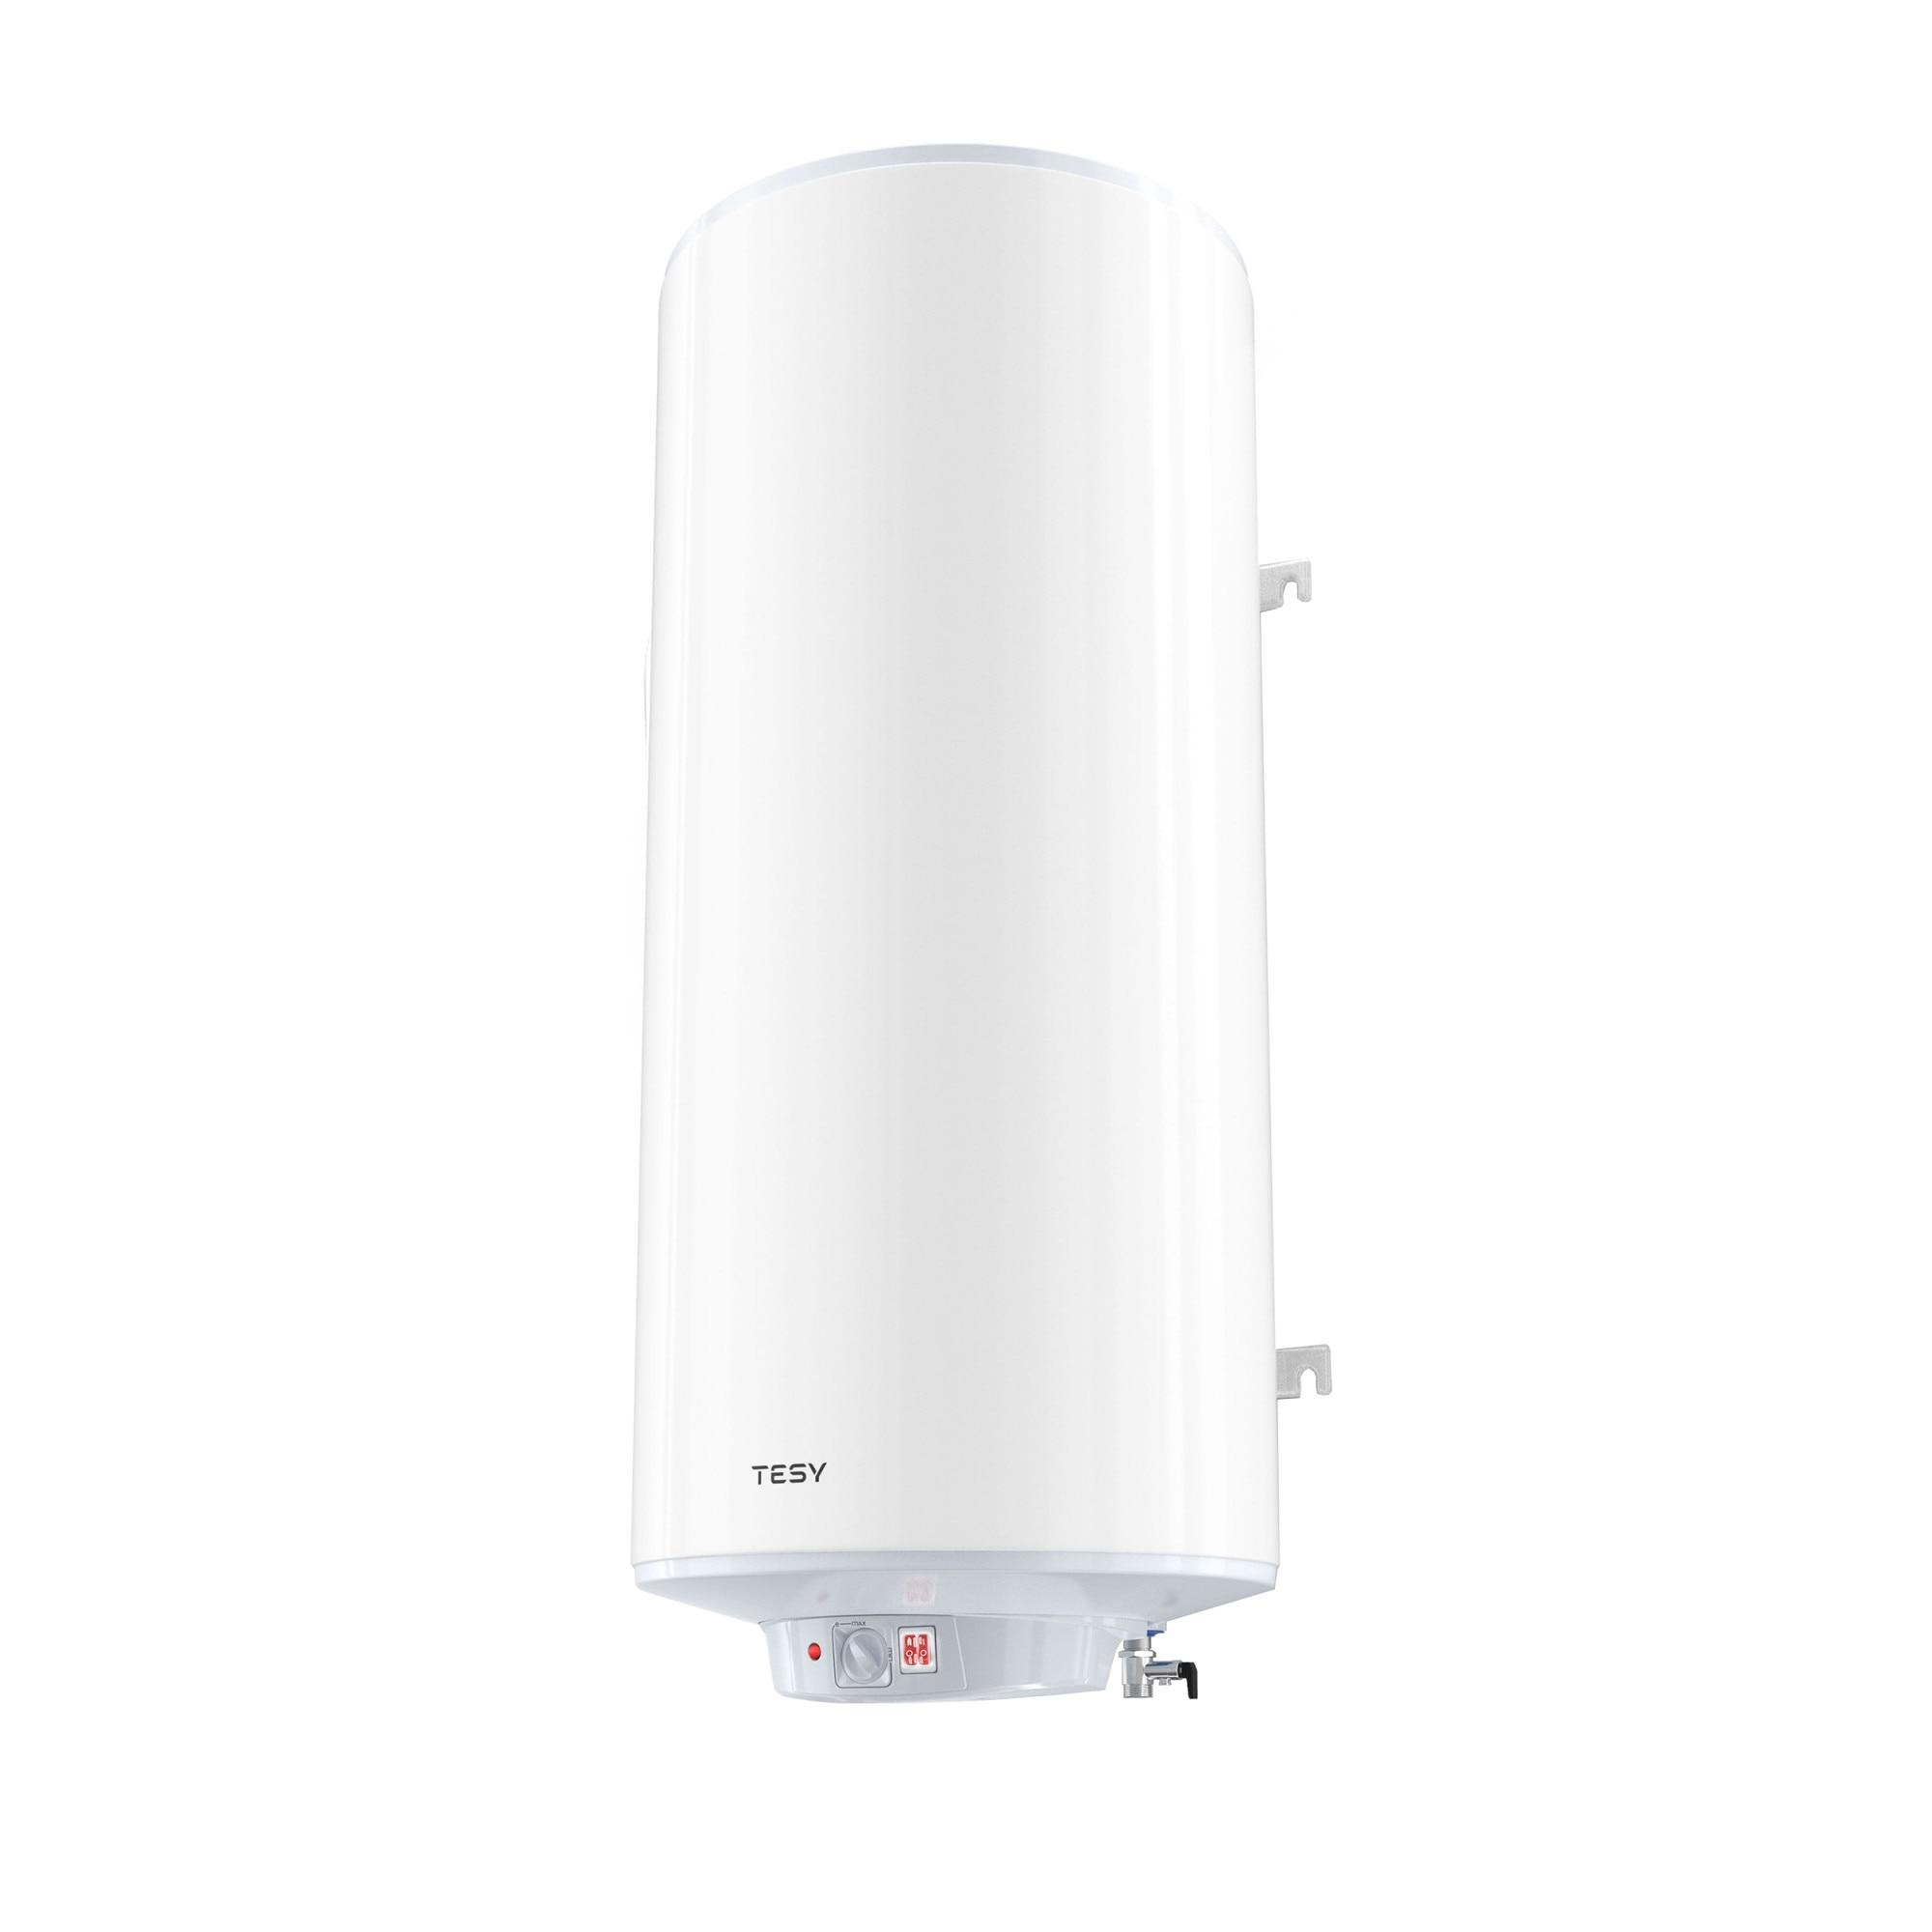 Fotografie Boiler electric Tesy MaxEau GCV 2005624C D06 S2RC, 2400W, 200 l, 8 bar, protectie anti-inghet, 40mm, Alb